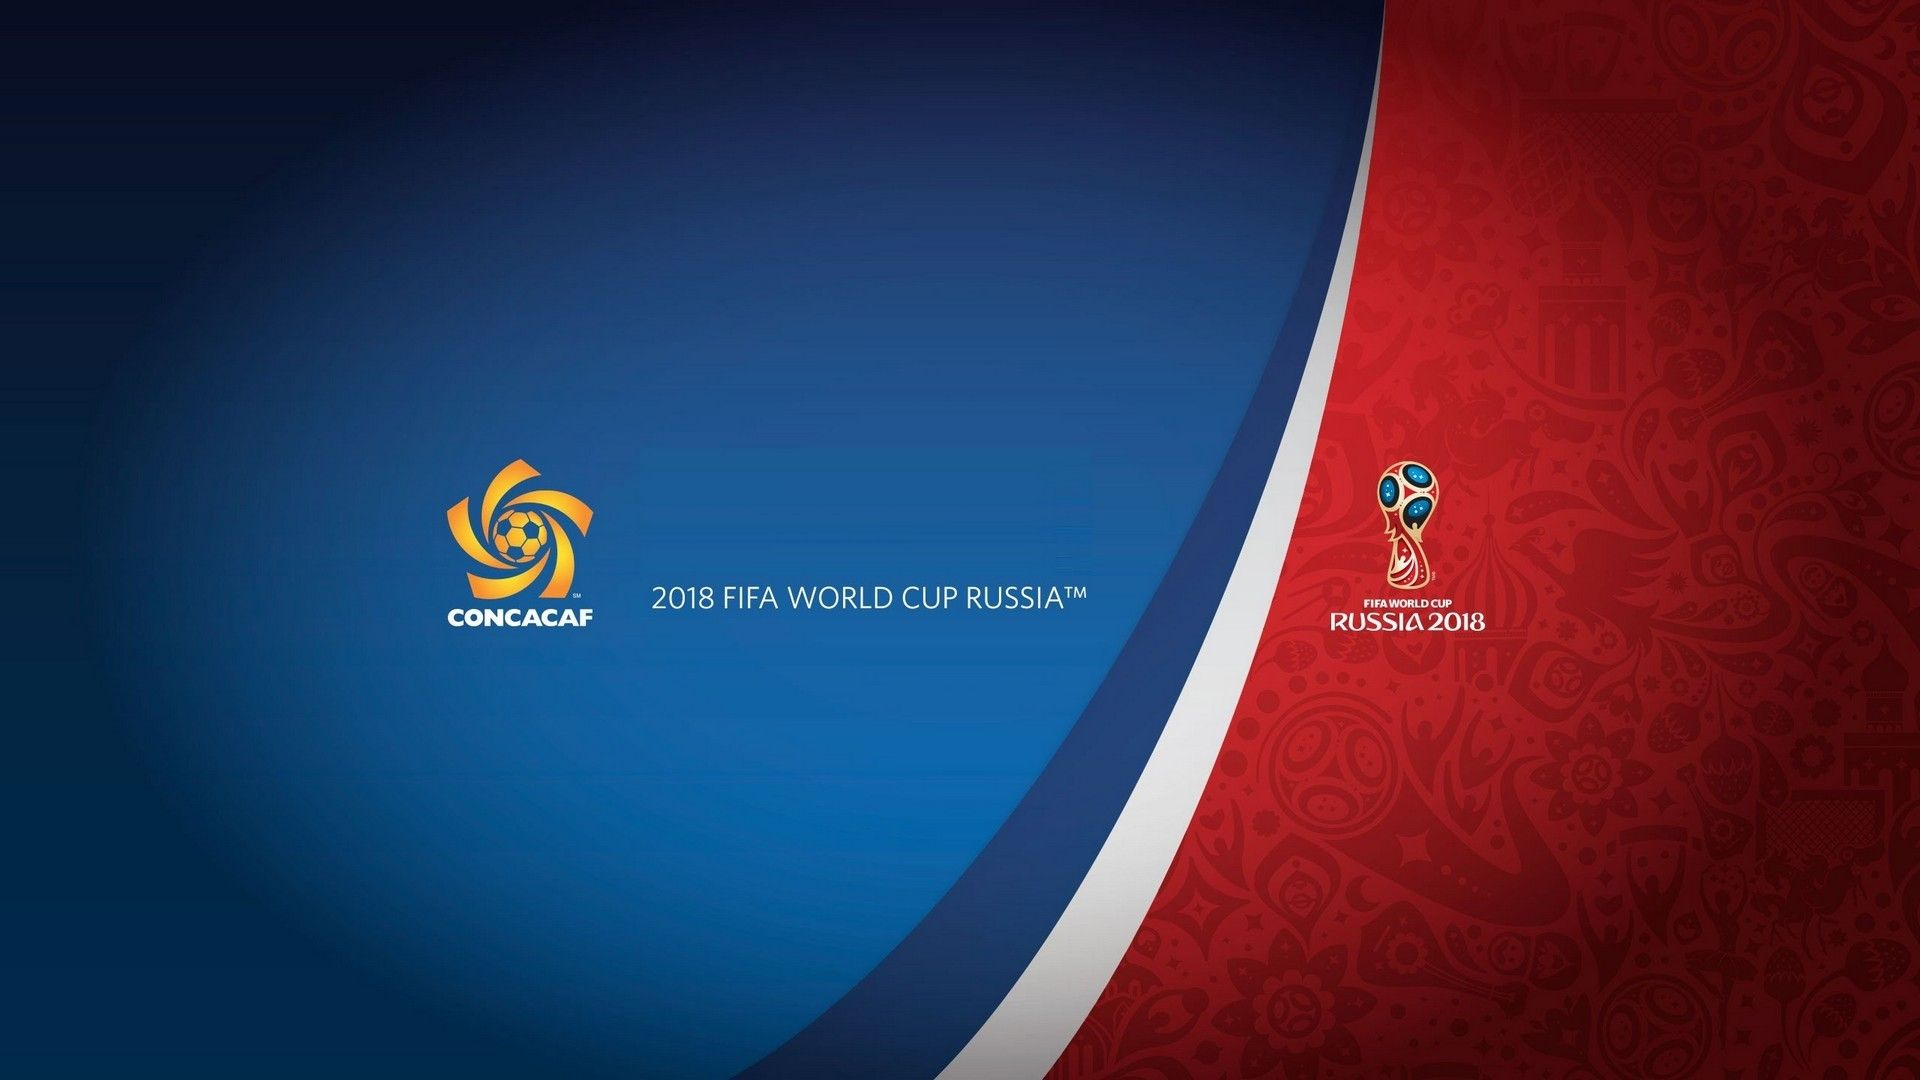 Wallpaper Fifa World Cup Best Hd Wallpapers Fifa World Cup Hd Cute Wallpapers Cute Wallpapers